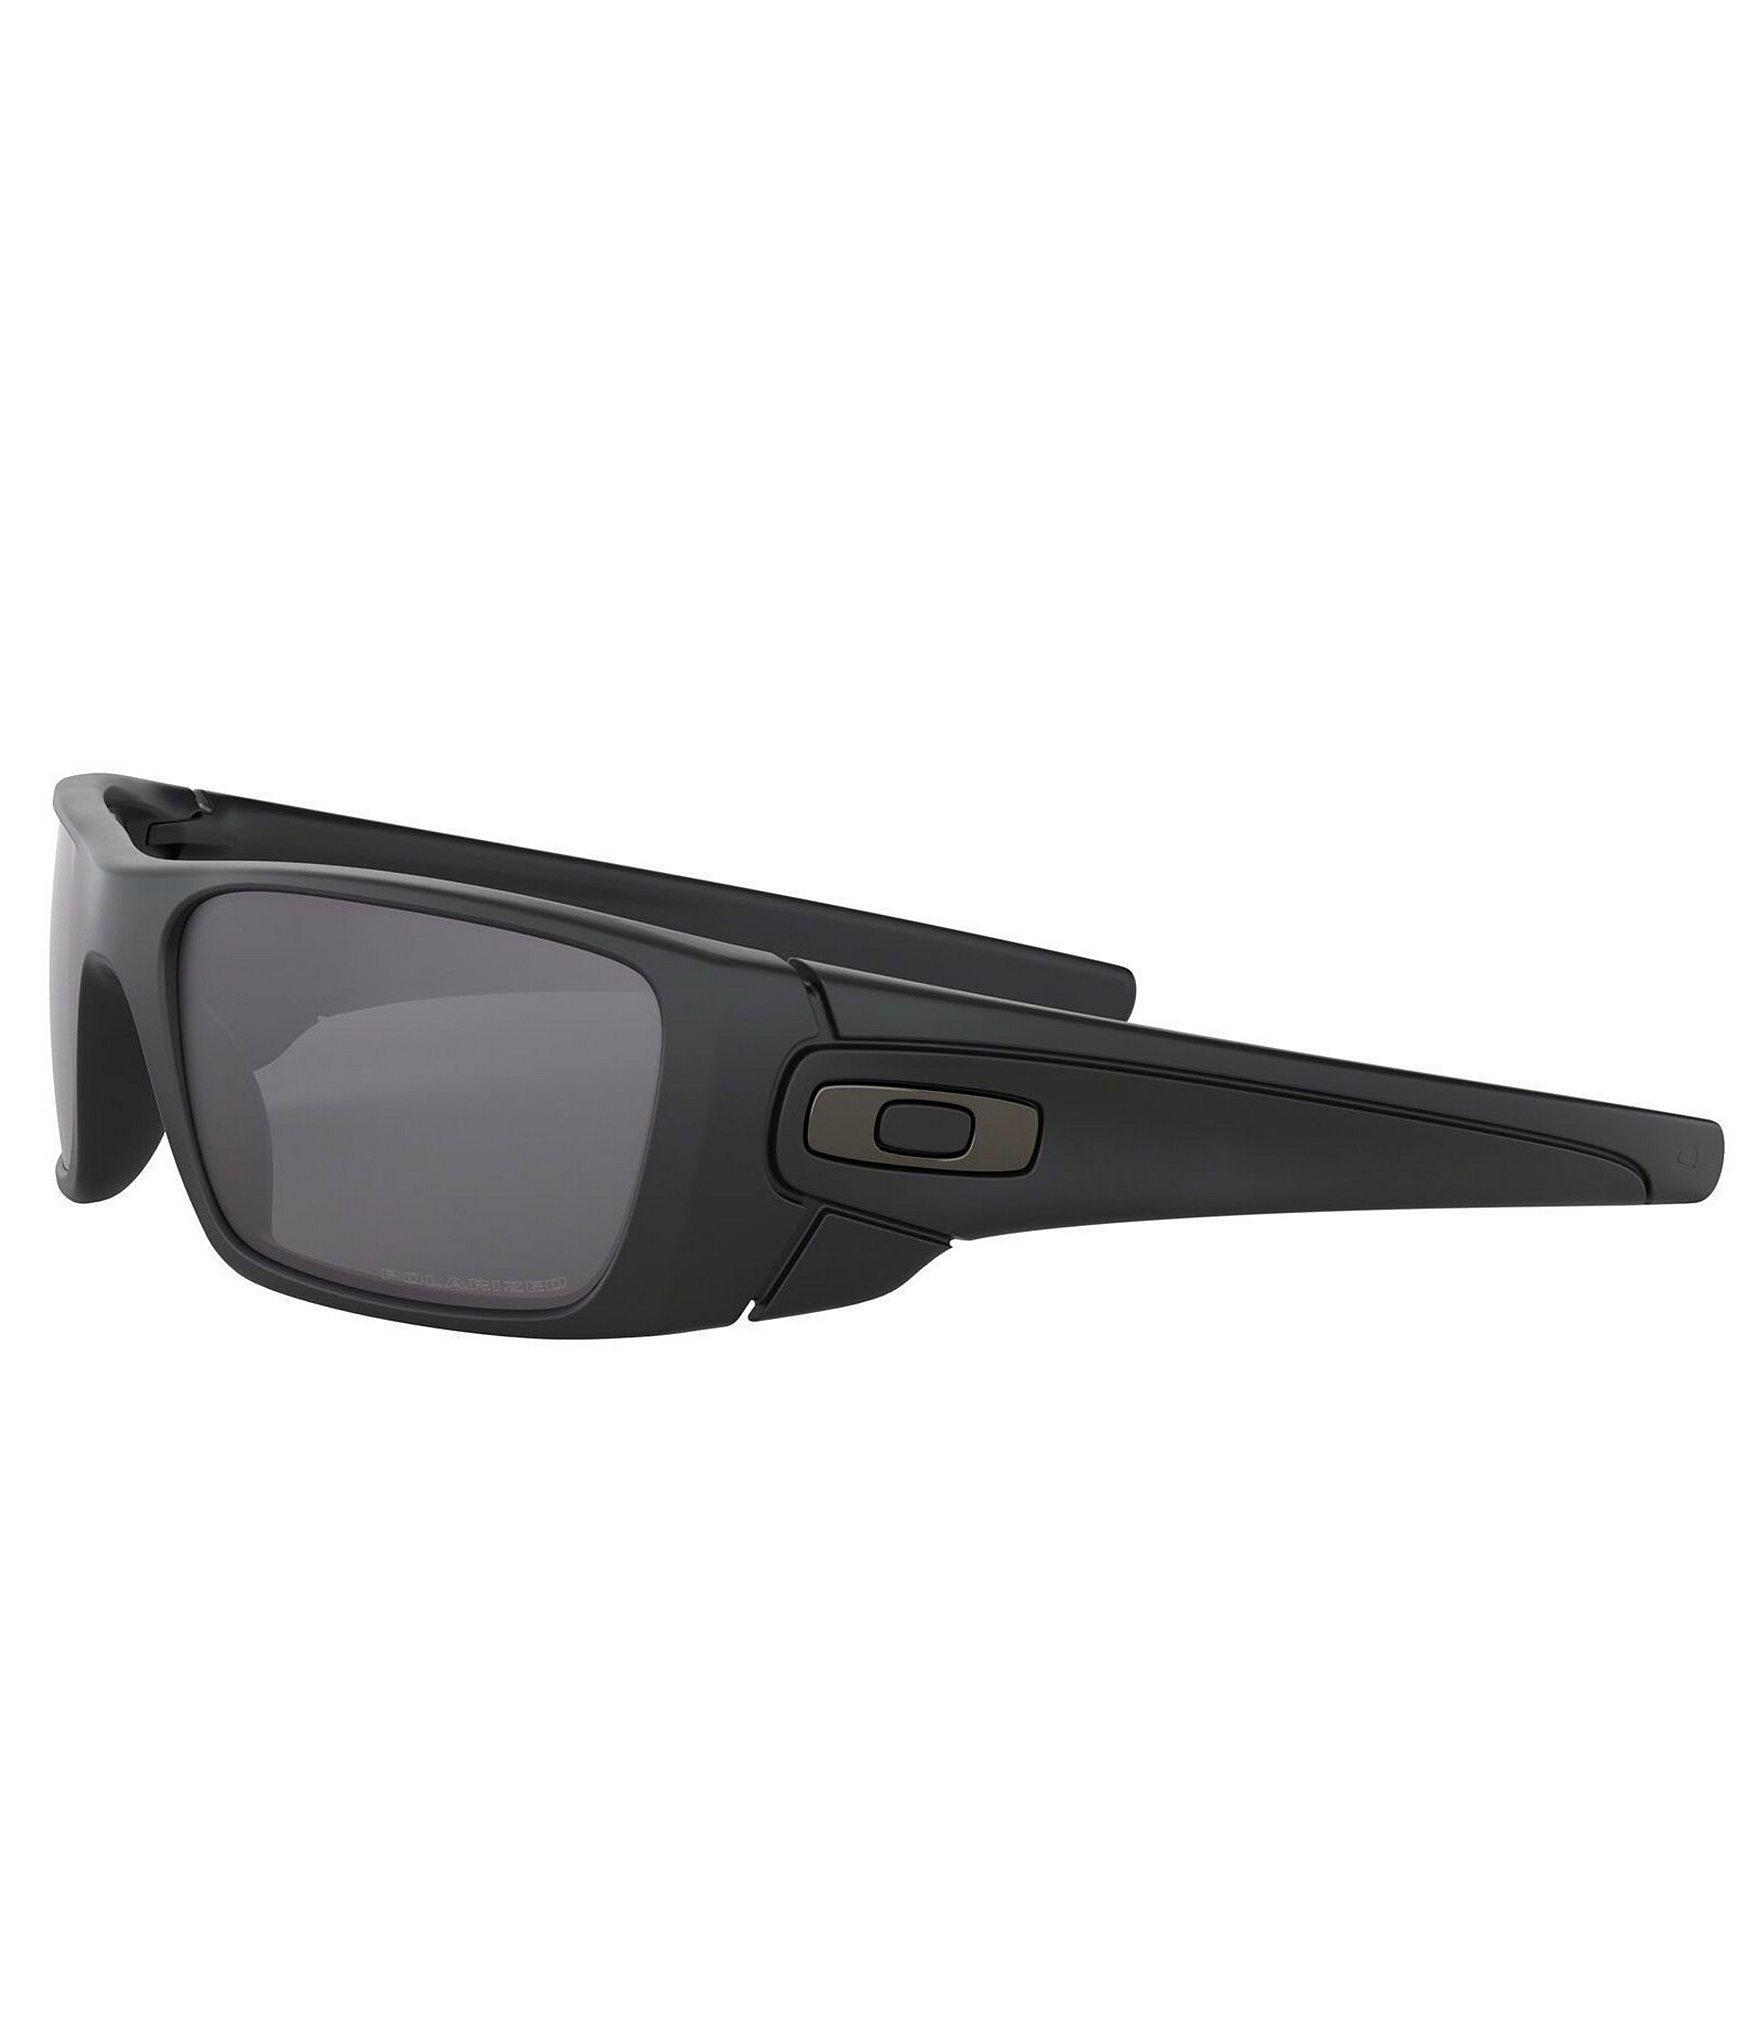 Oakley Fuel Cell Polarized >> Men S Black Fuel Cell Polarized Sunglasses